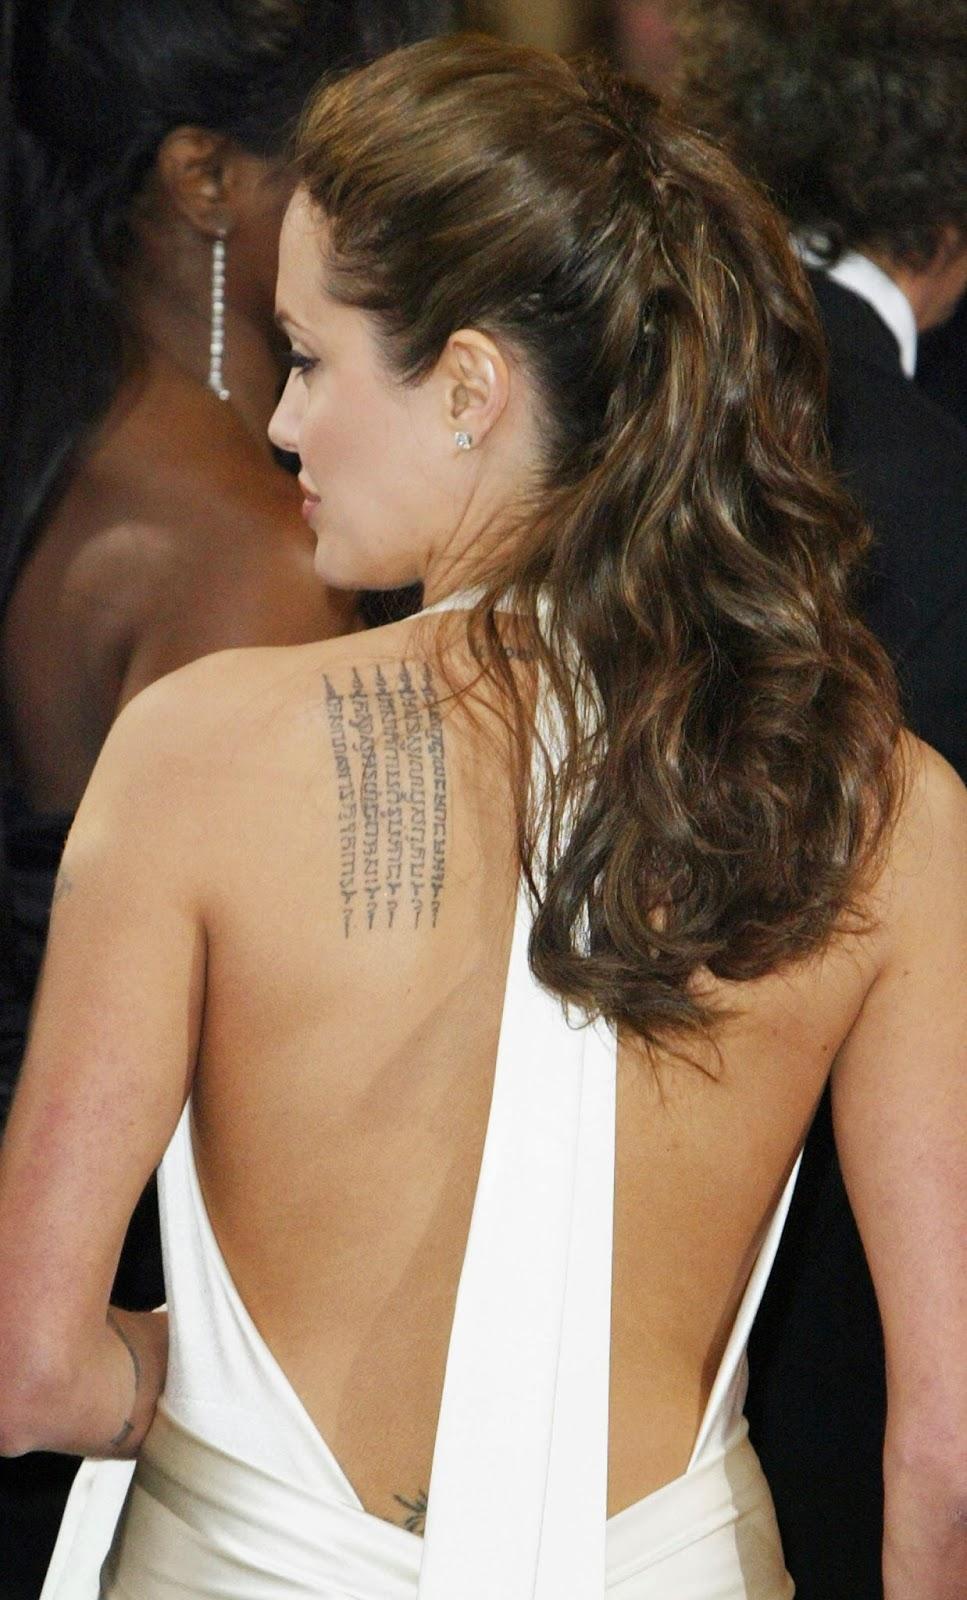 TATTOOS GALLERY WORLD: Angelina Jolie Back Tattoos